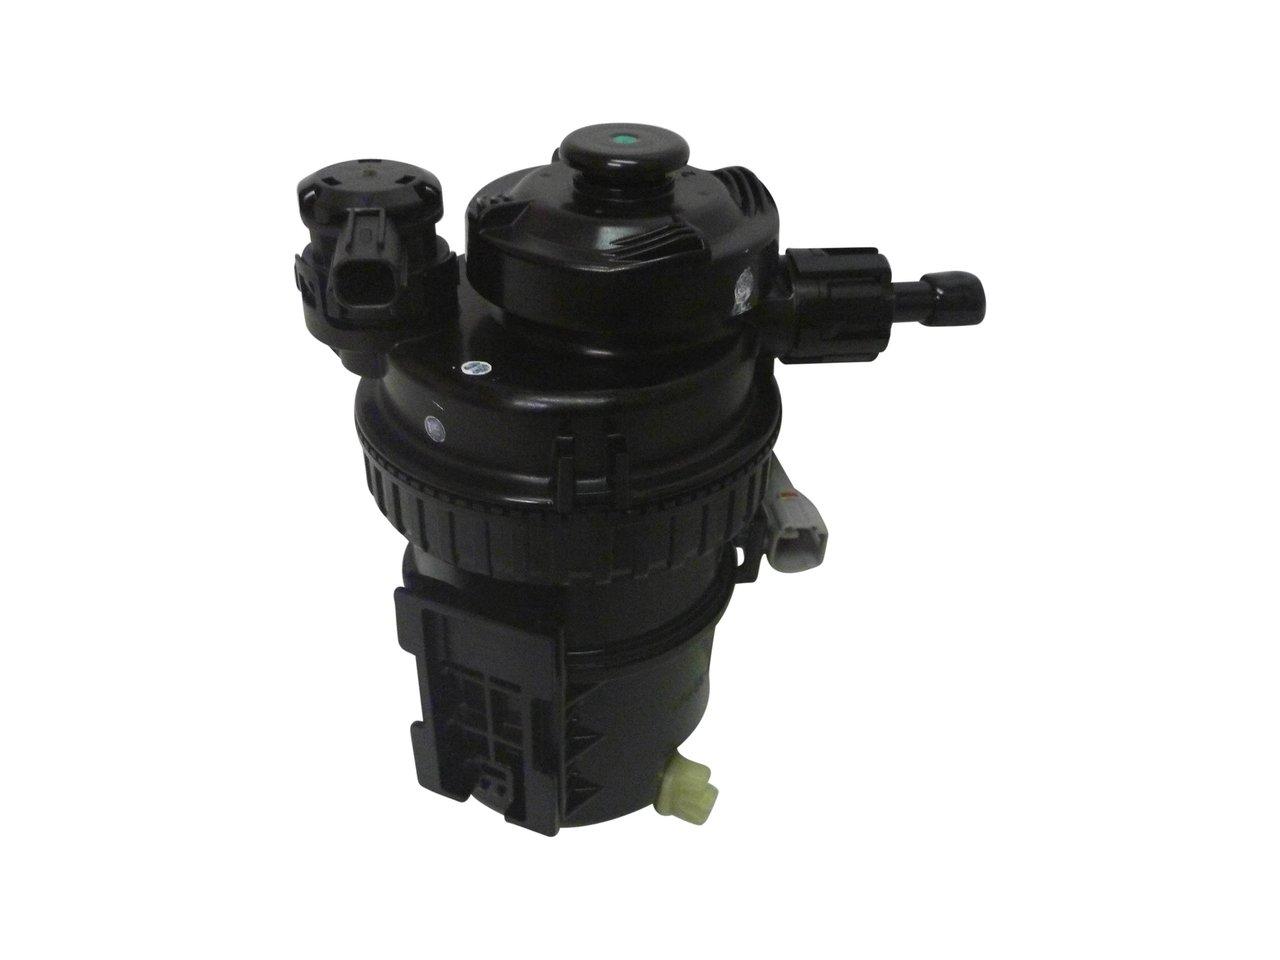 Genuine Fuel Filter Assembly Suitable For Hilux D4d Turbo Diesel Kun16 Kun26